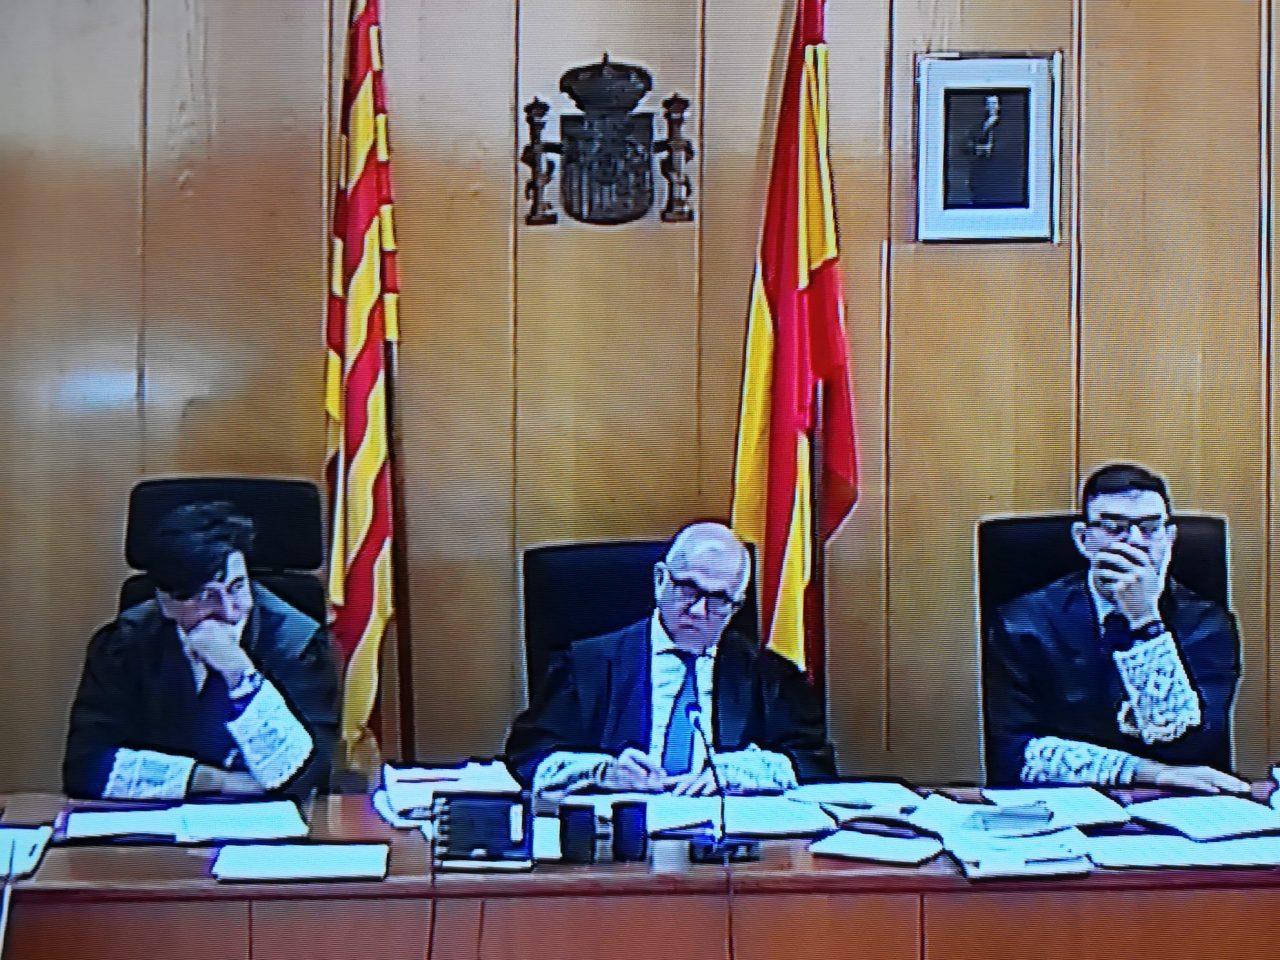 mossos_judici5-1280x960.jpg